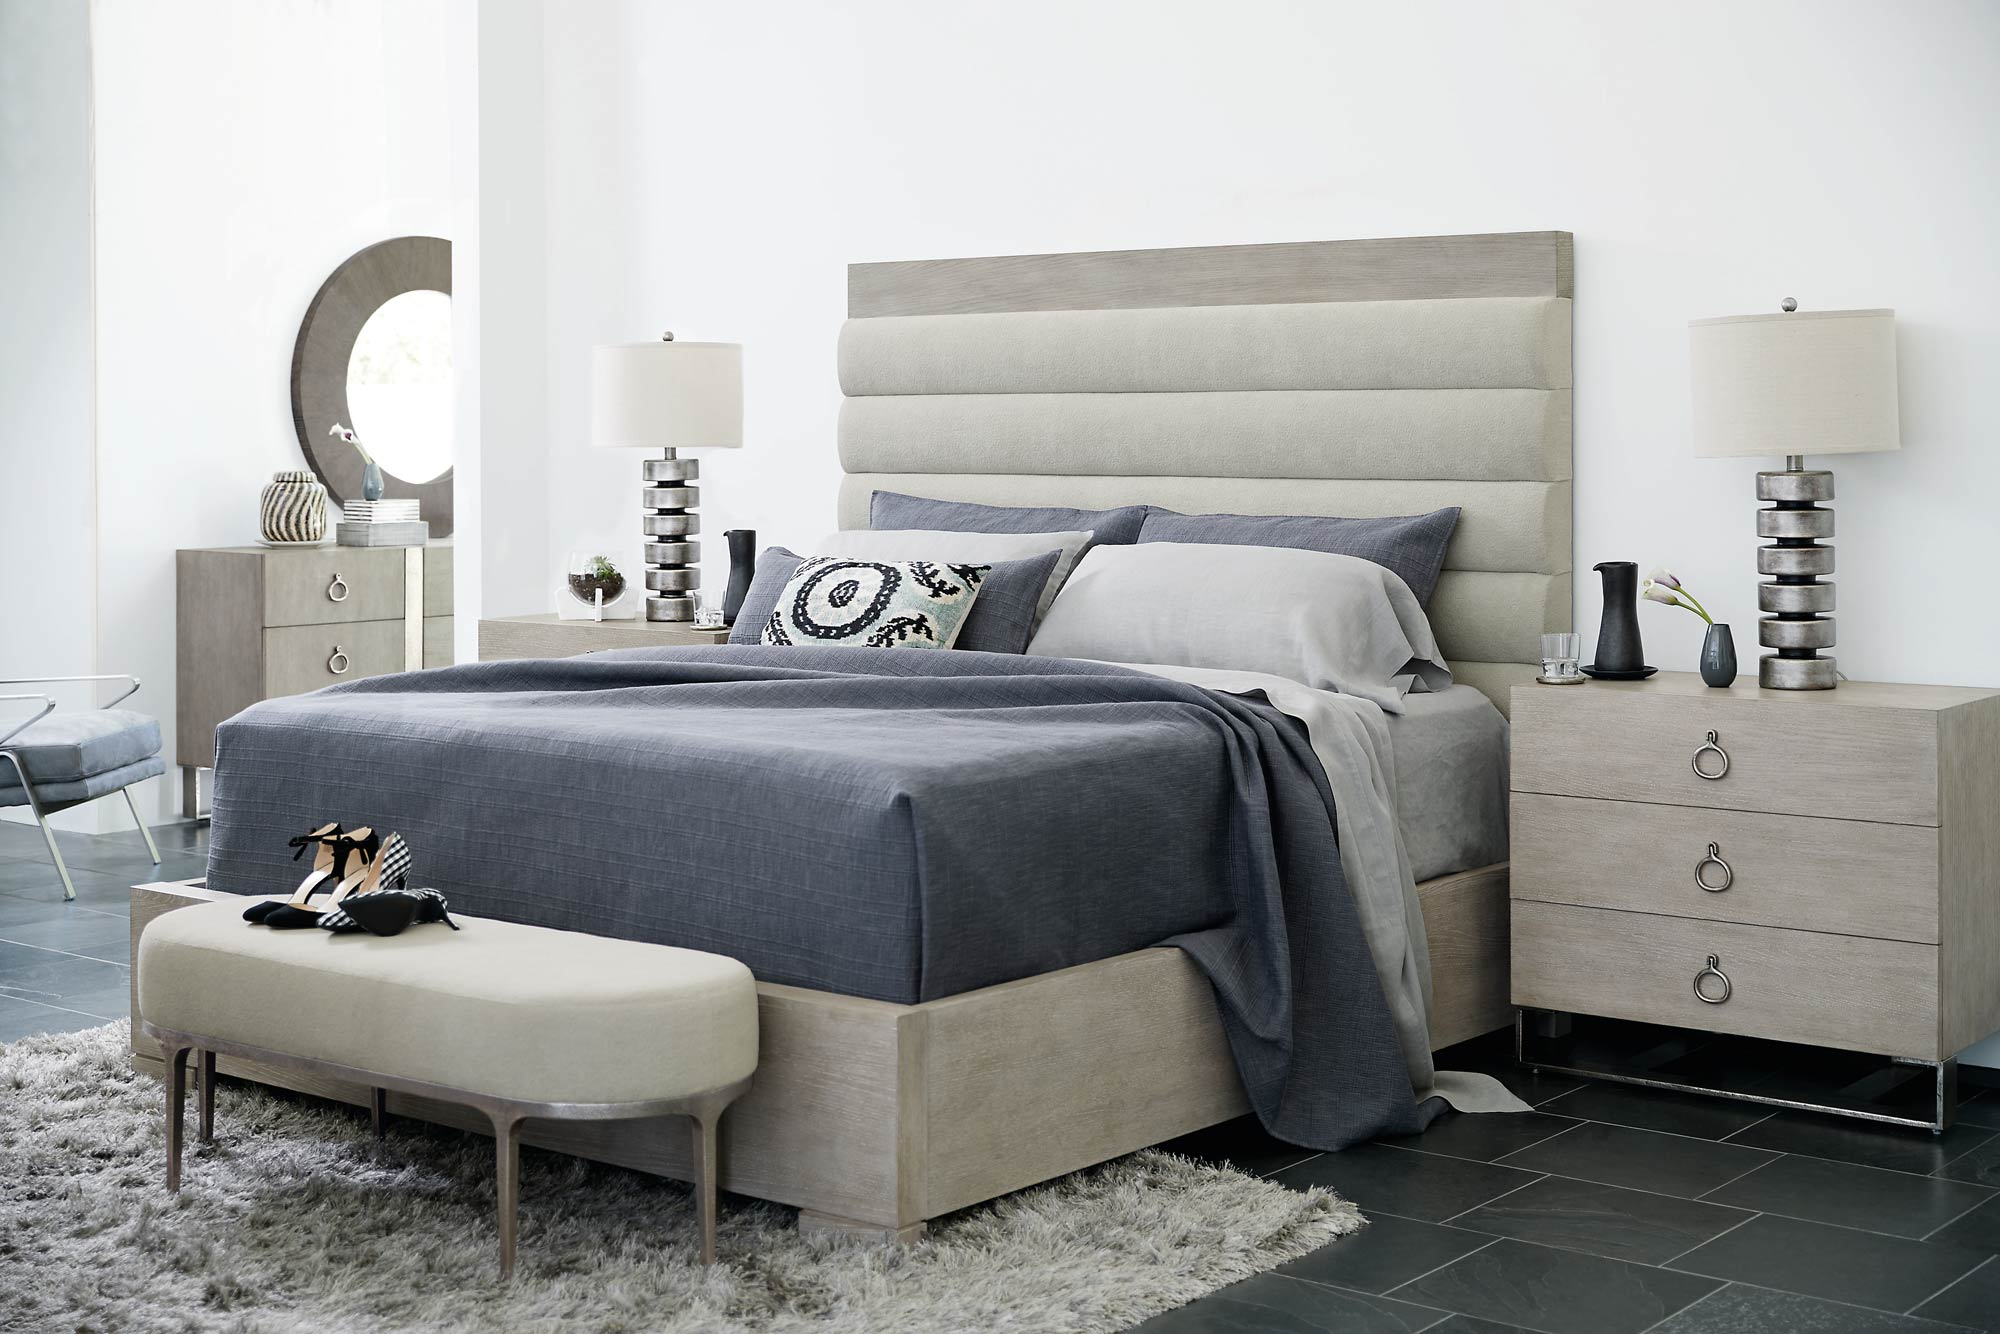 Bedroom Interior Design Portsmouth, NH